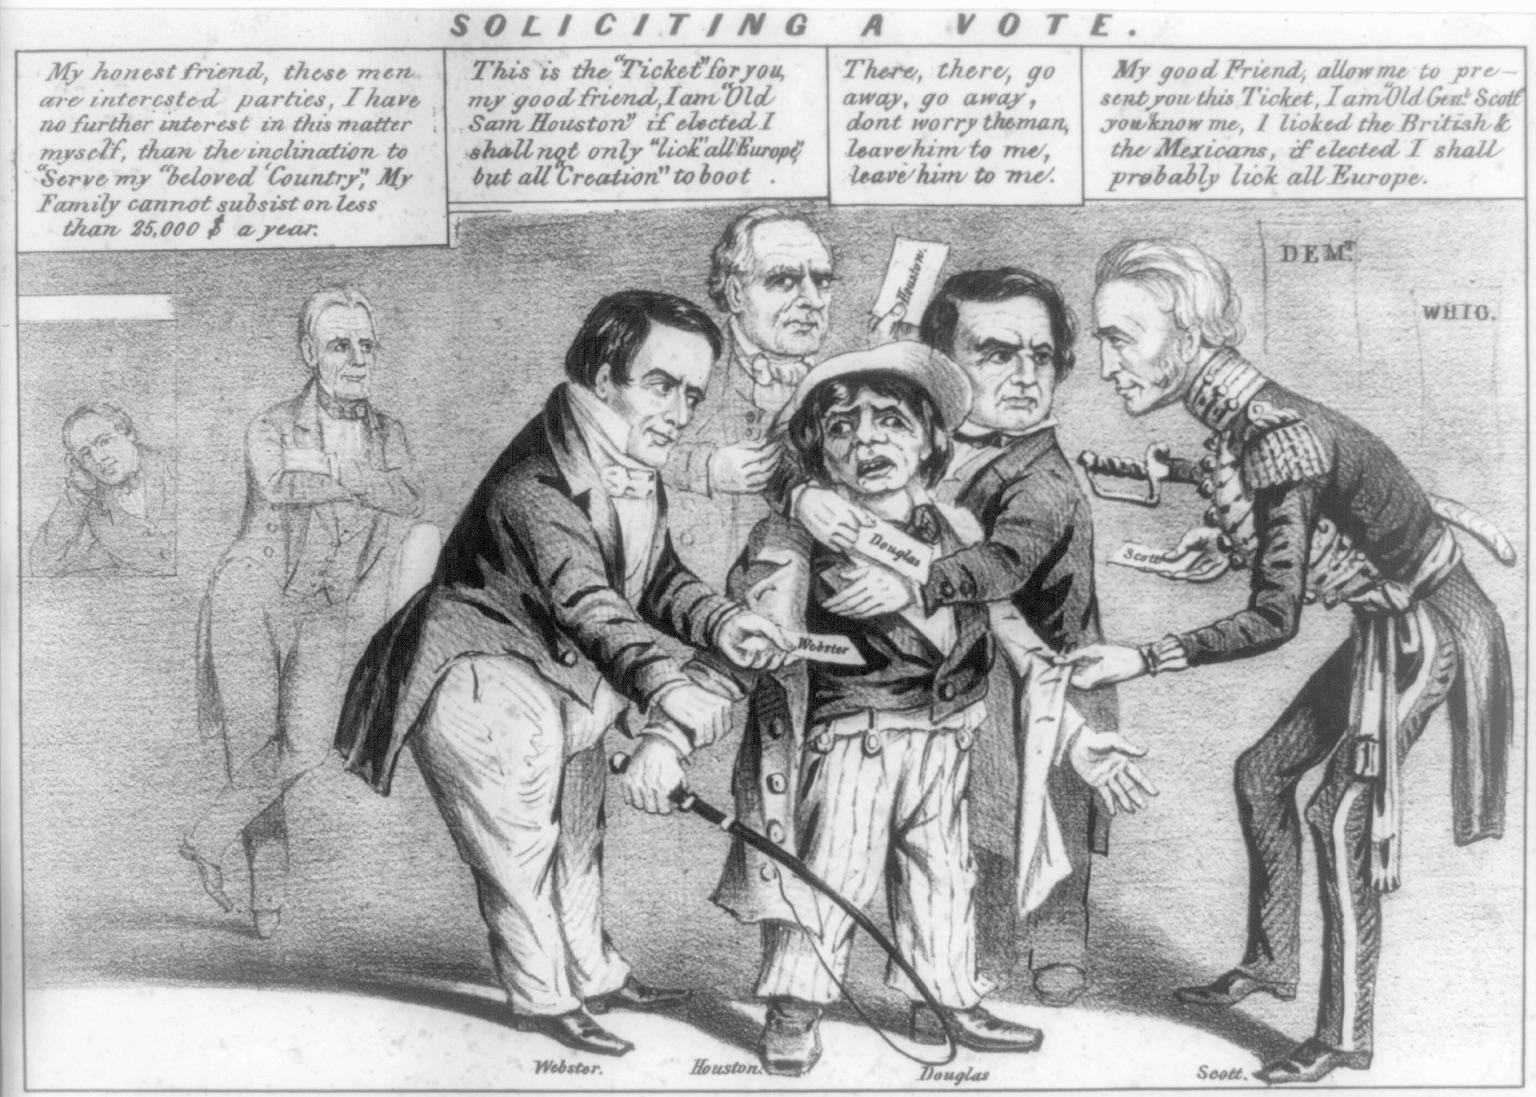 """Soliciting a Vote"" – an 1852 political cartoon"